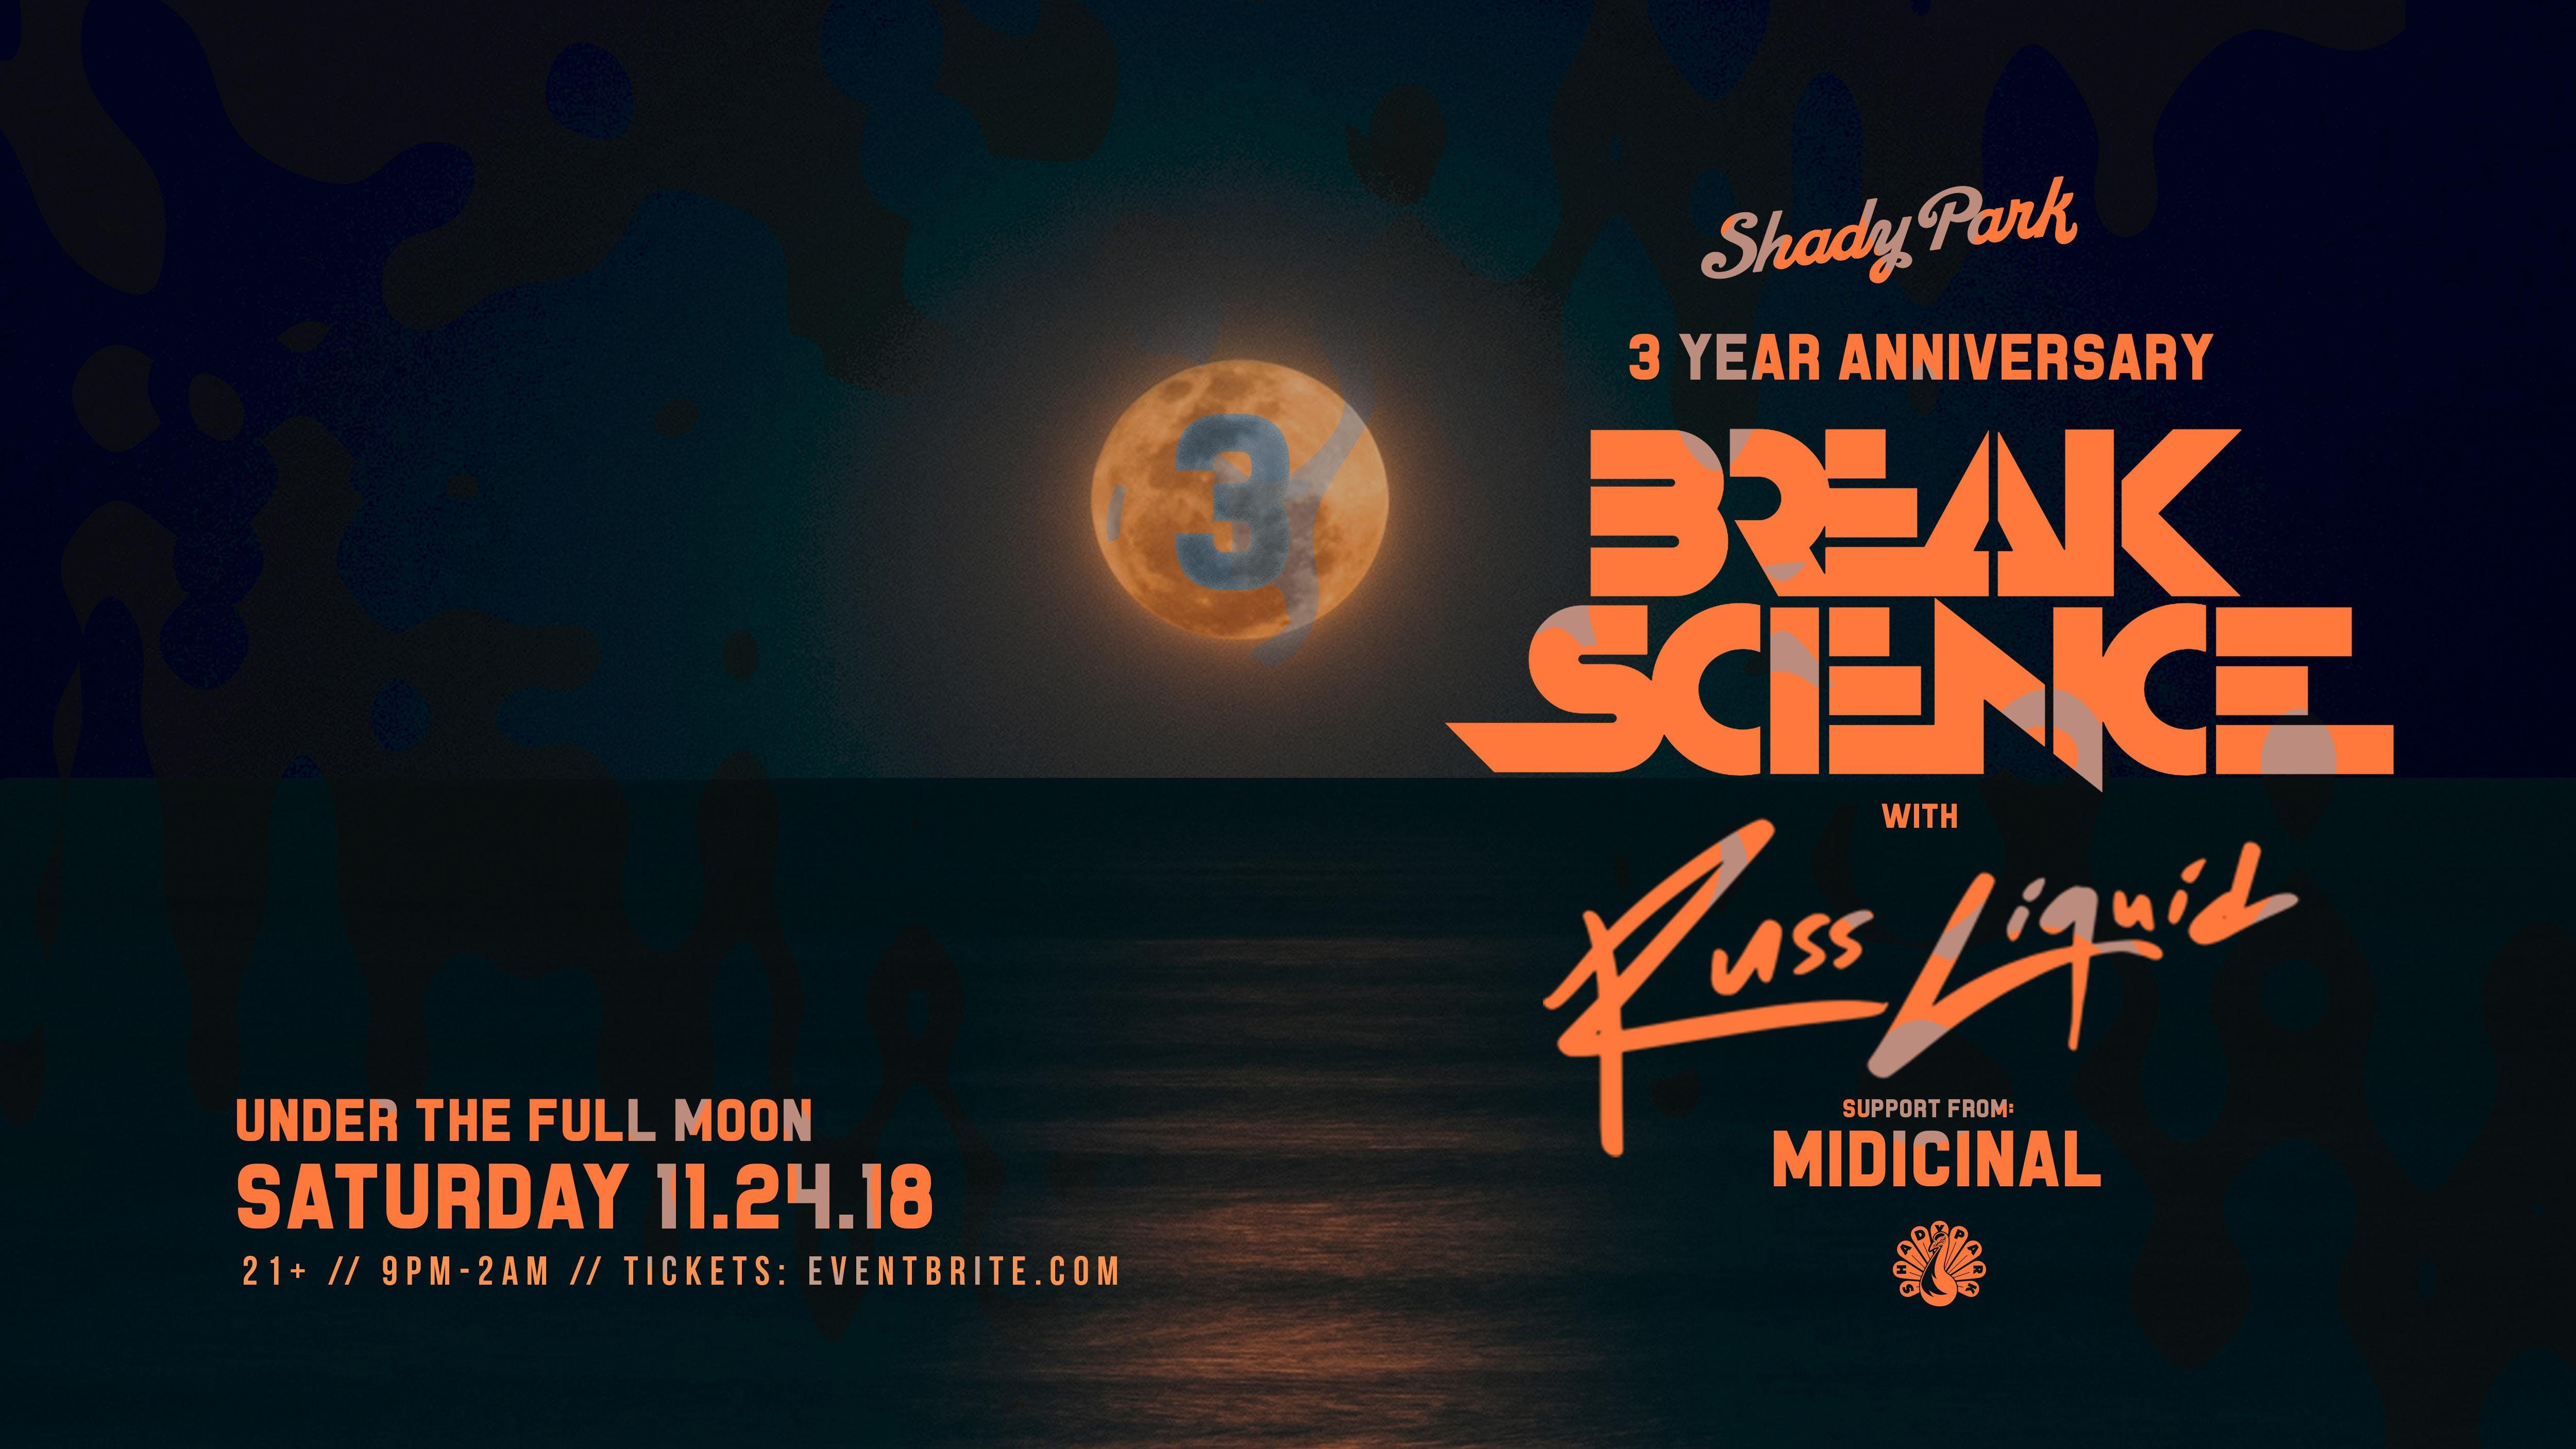 Shady Park 3 Year Anniversary: Break Science w/ Russ Liquid